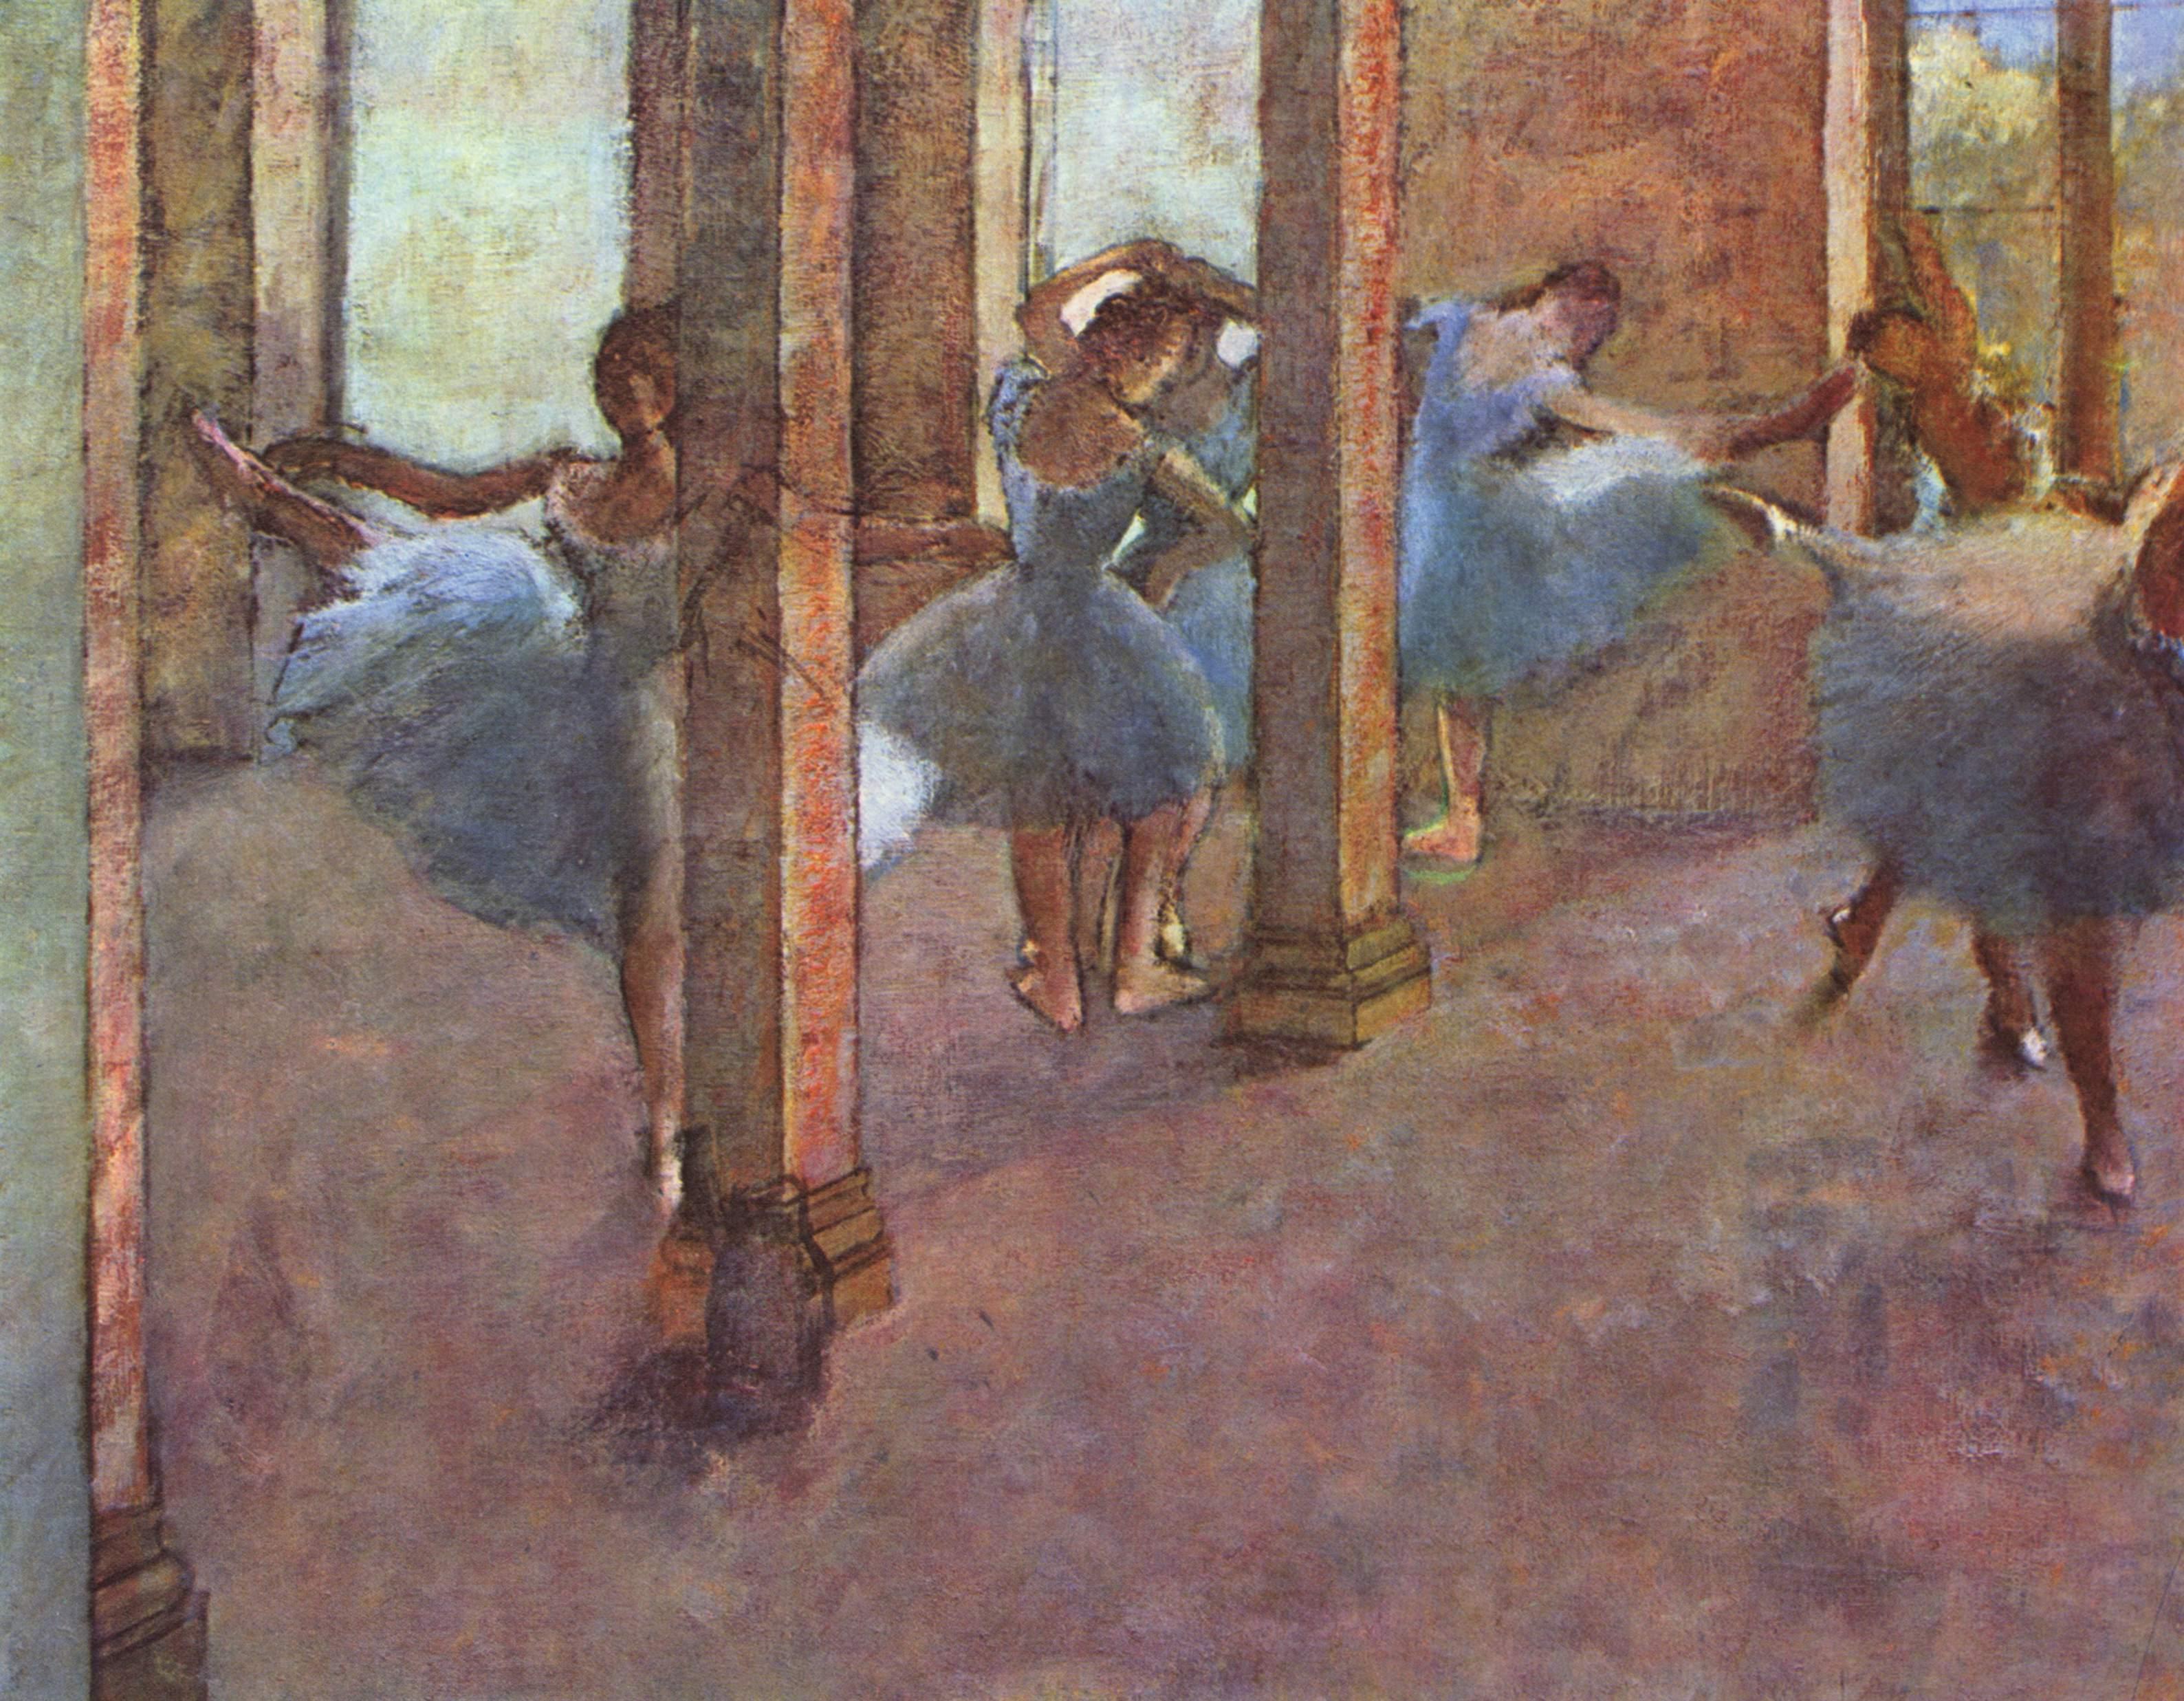 File:Edgar Germain Hilaire Degas 071.jpg - Wikimedia Commons